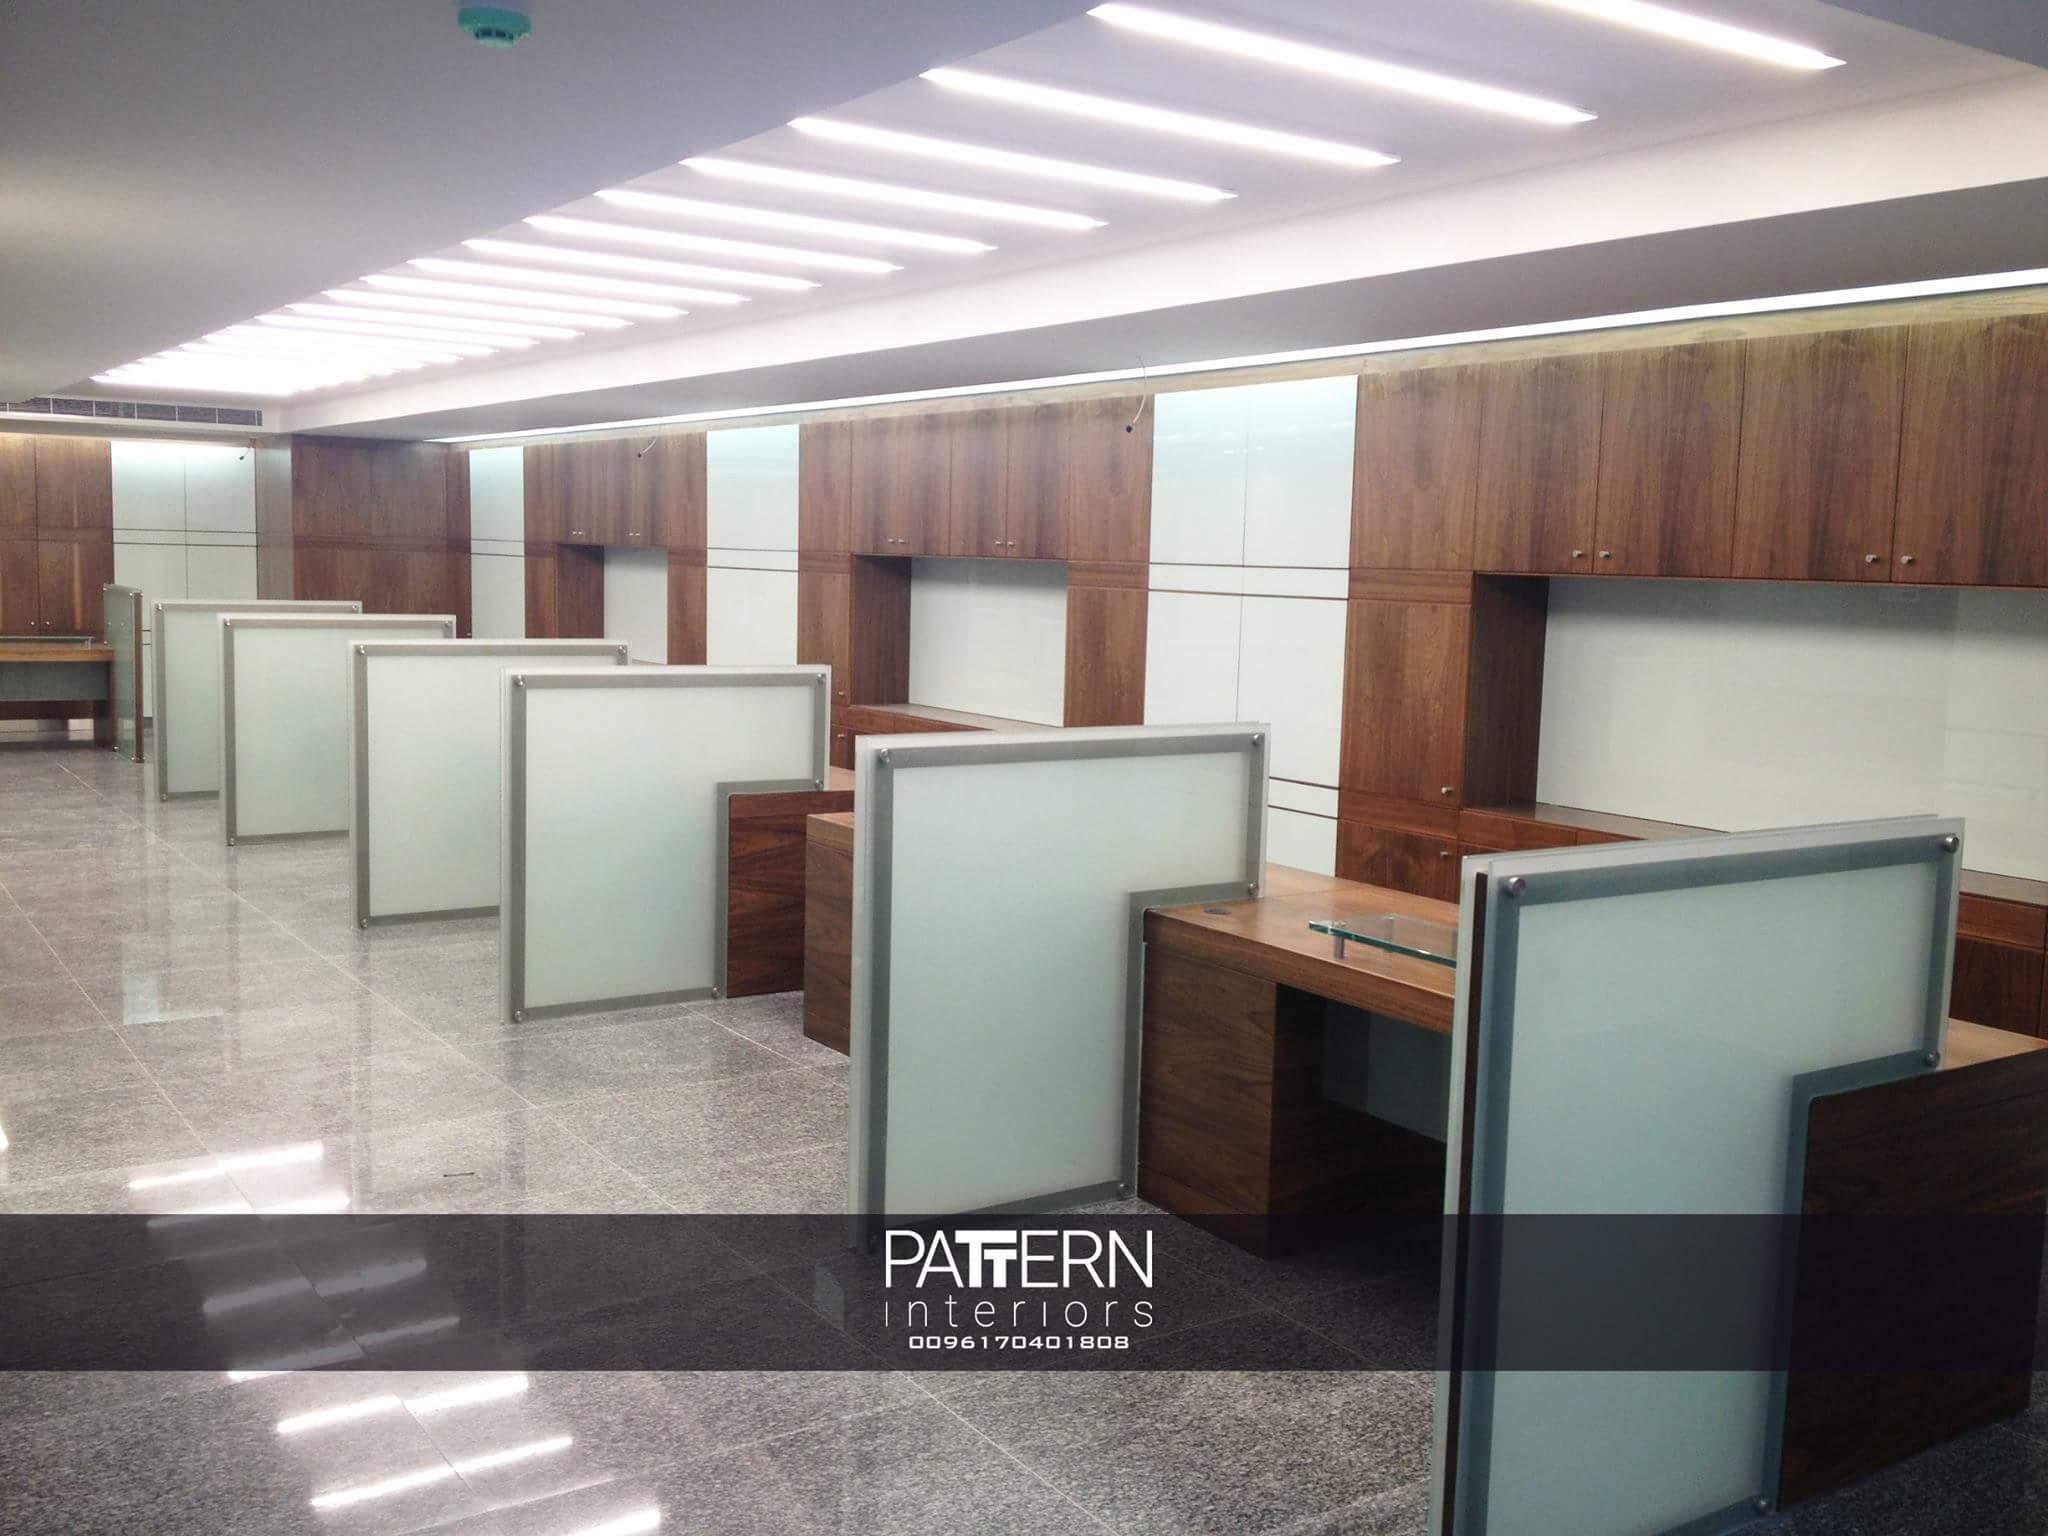 patterninteriors-wood-woodwall-design-designer-portfolio-designproject-journey-interiorarchitect-luxury-topdesign-lifestyle2016-lebanon-proudlylebanese-bestdesigner